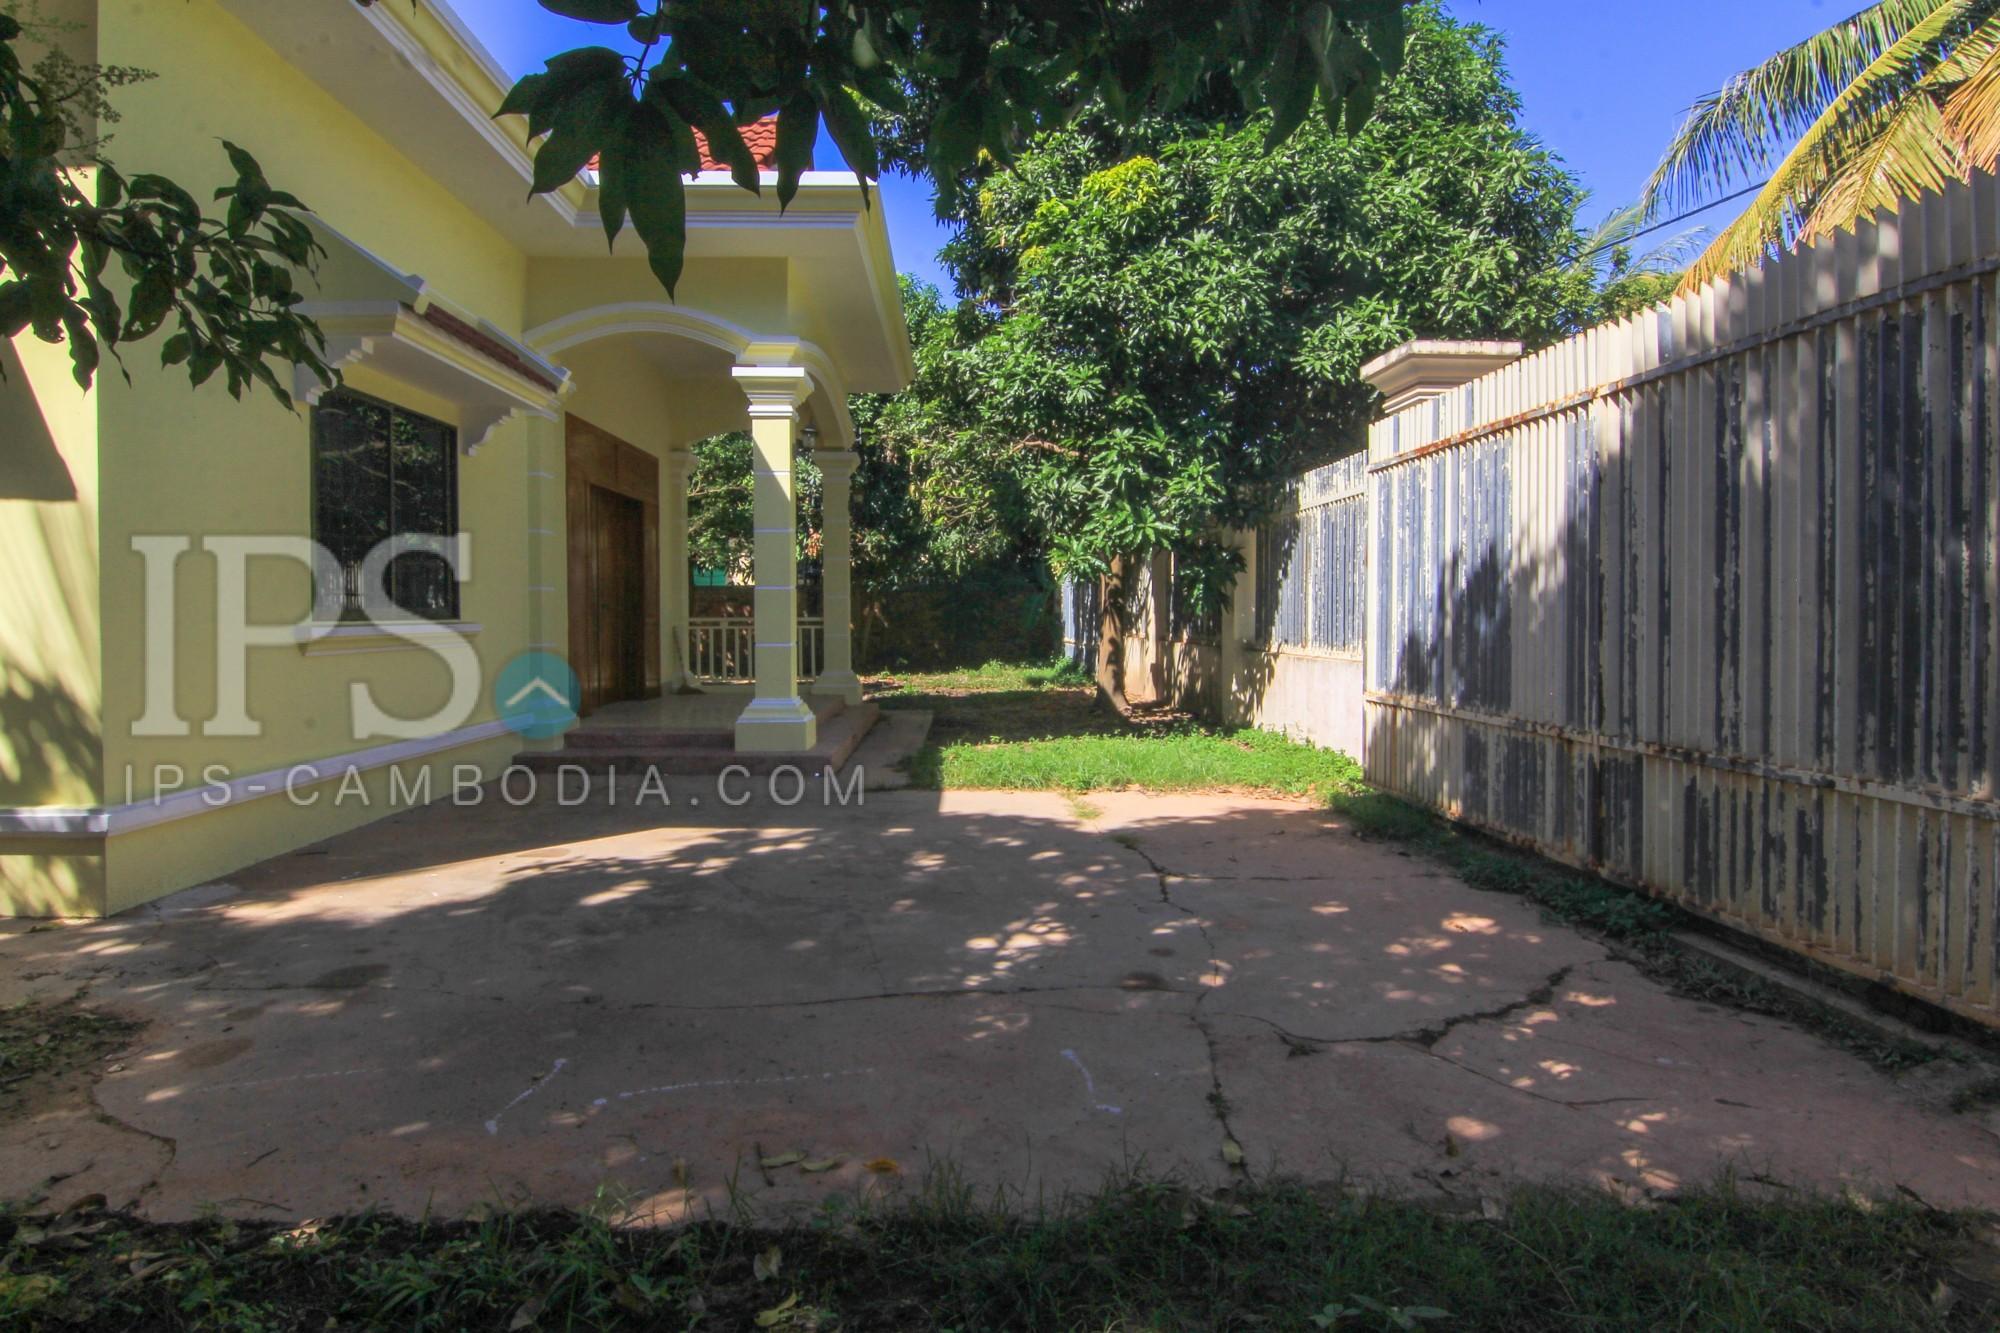 3 Bedroom House For Rent - Svay Dangkum, Siem Reap